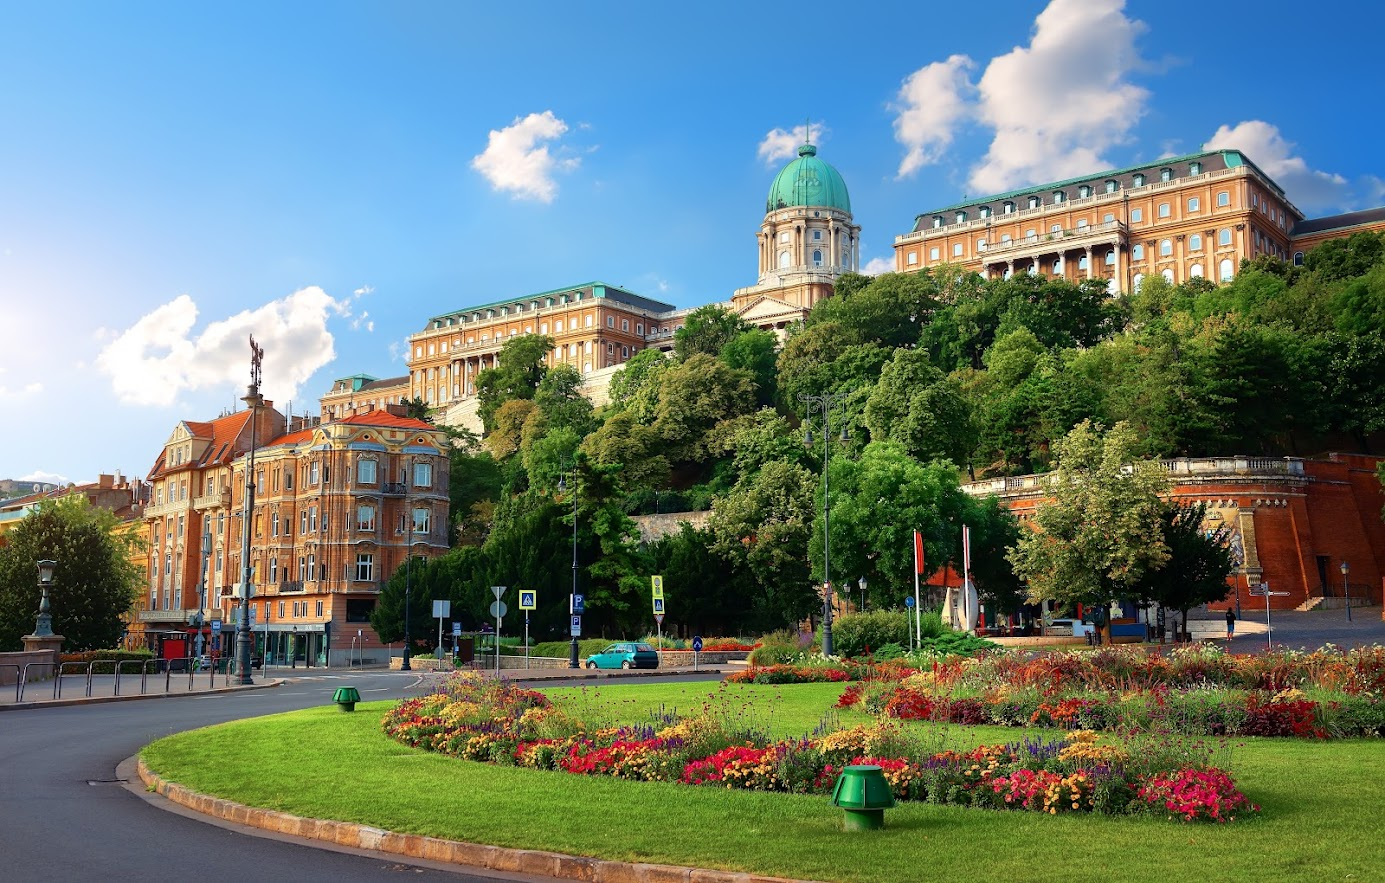 Budai vár, török kori emlékek Budapesten